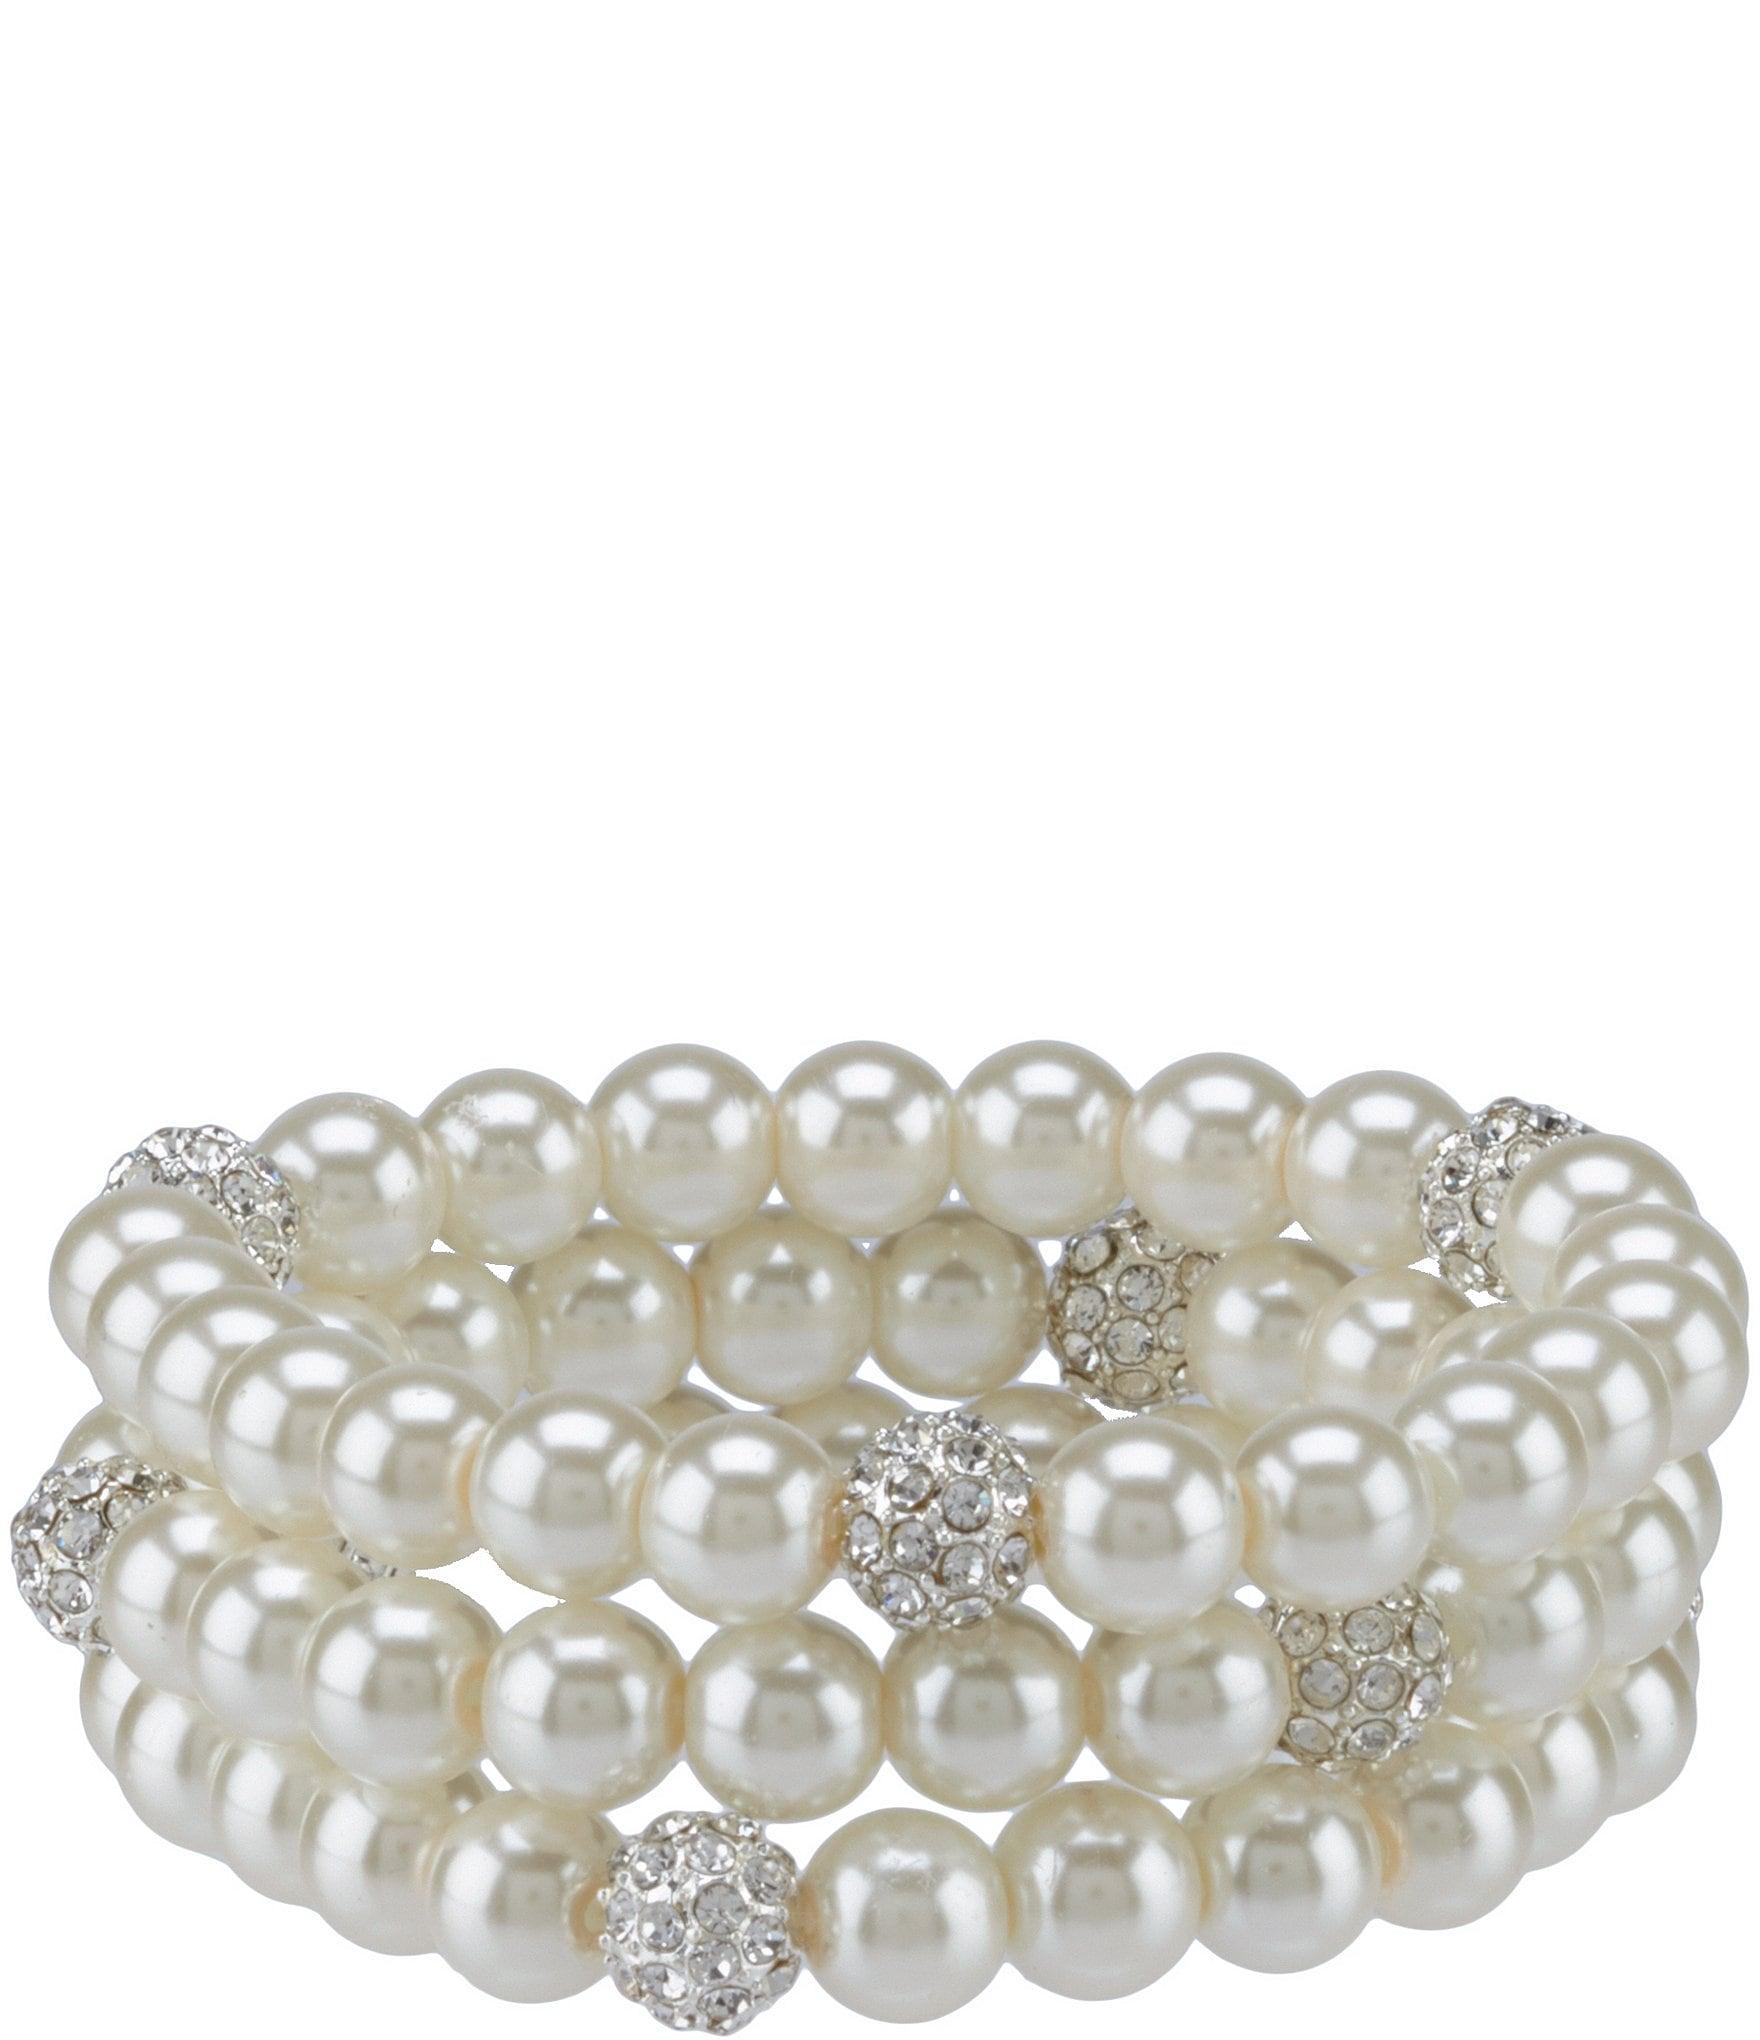 Pandora bracelet dillards - Pandora Bracelet Dillards 8